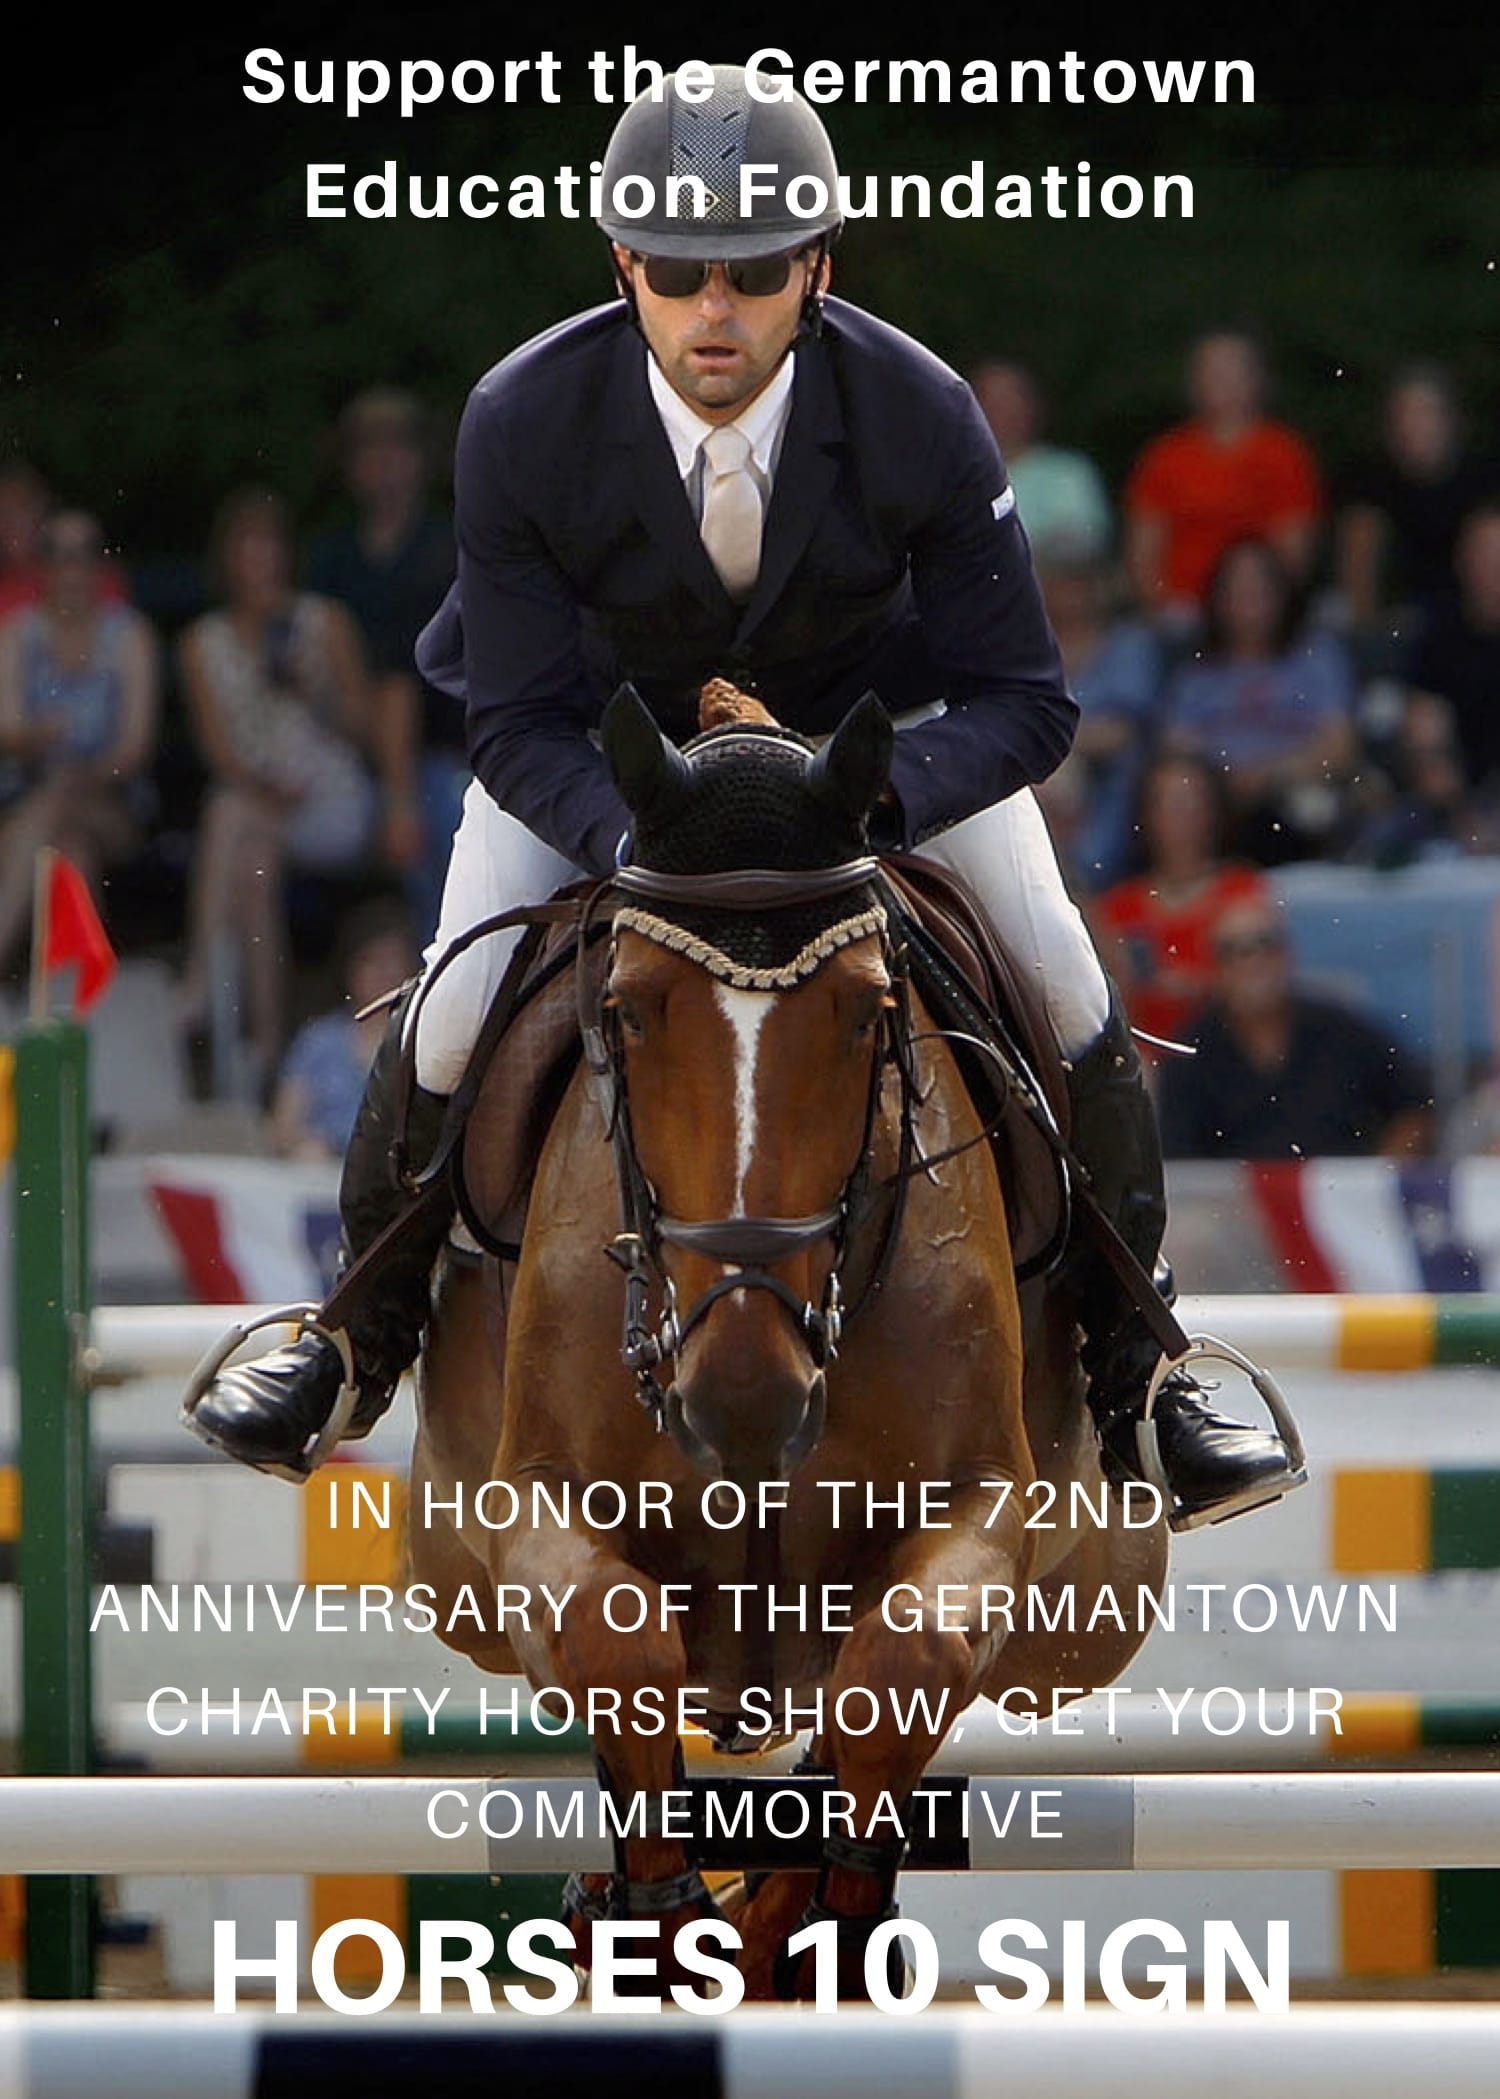 Horses 10 Fundraiser Ad (2)